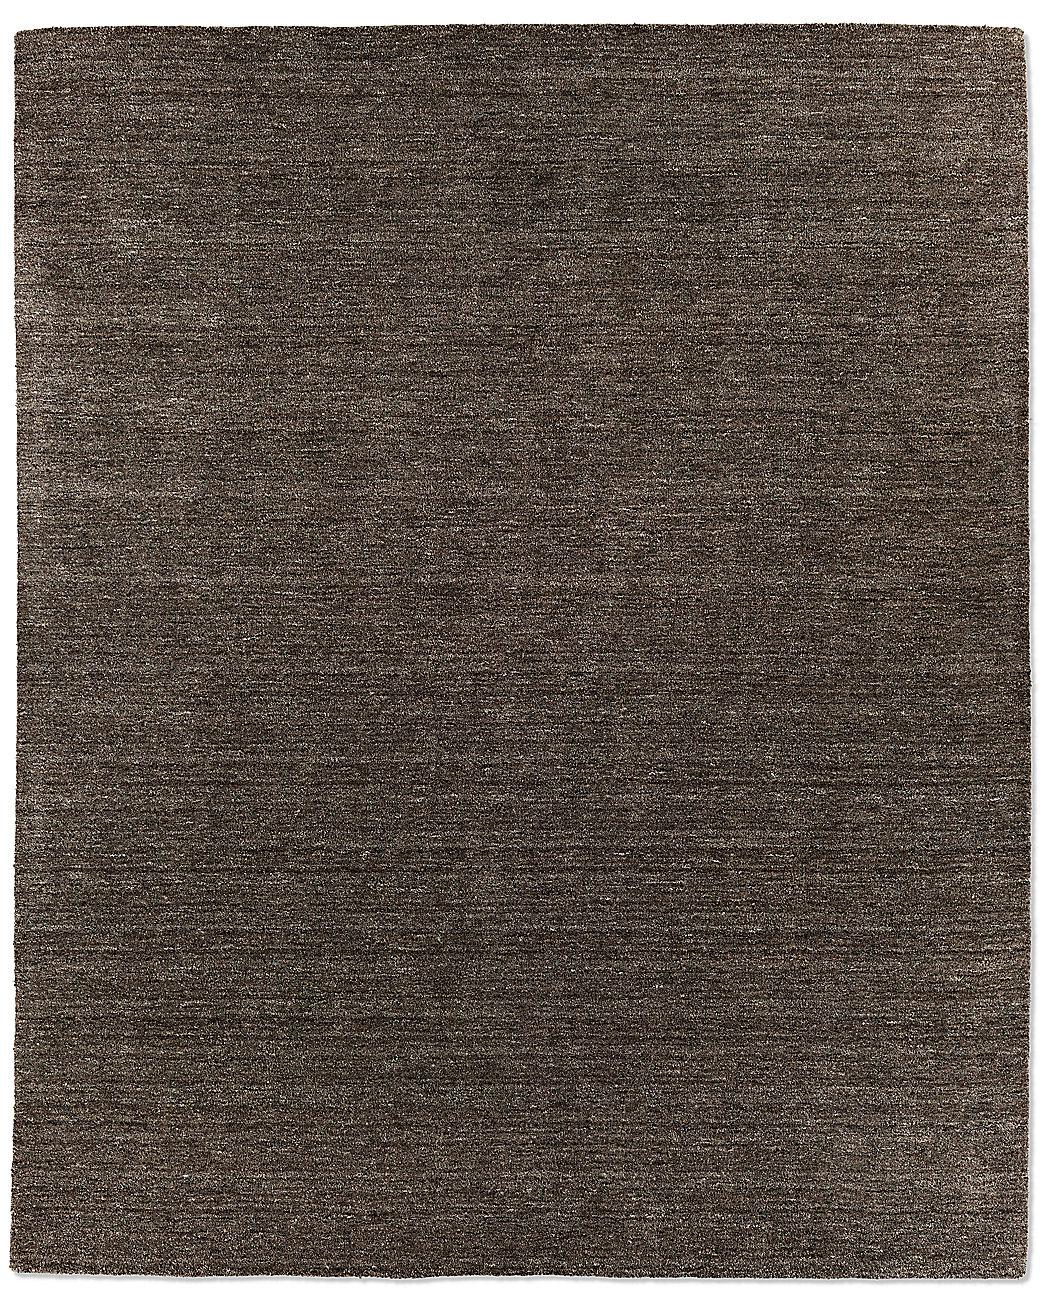 Striated Plush Wool Rug Charcoal